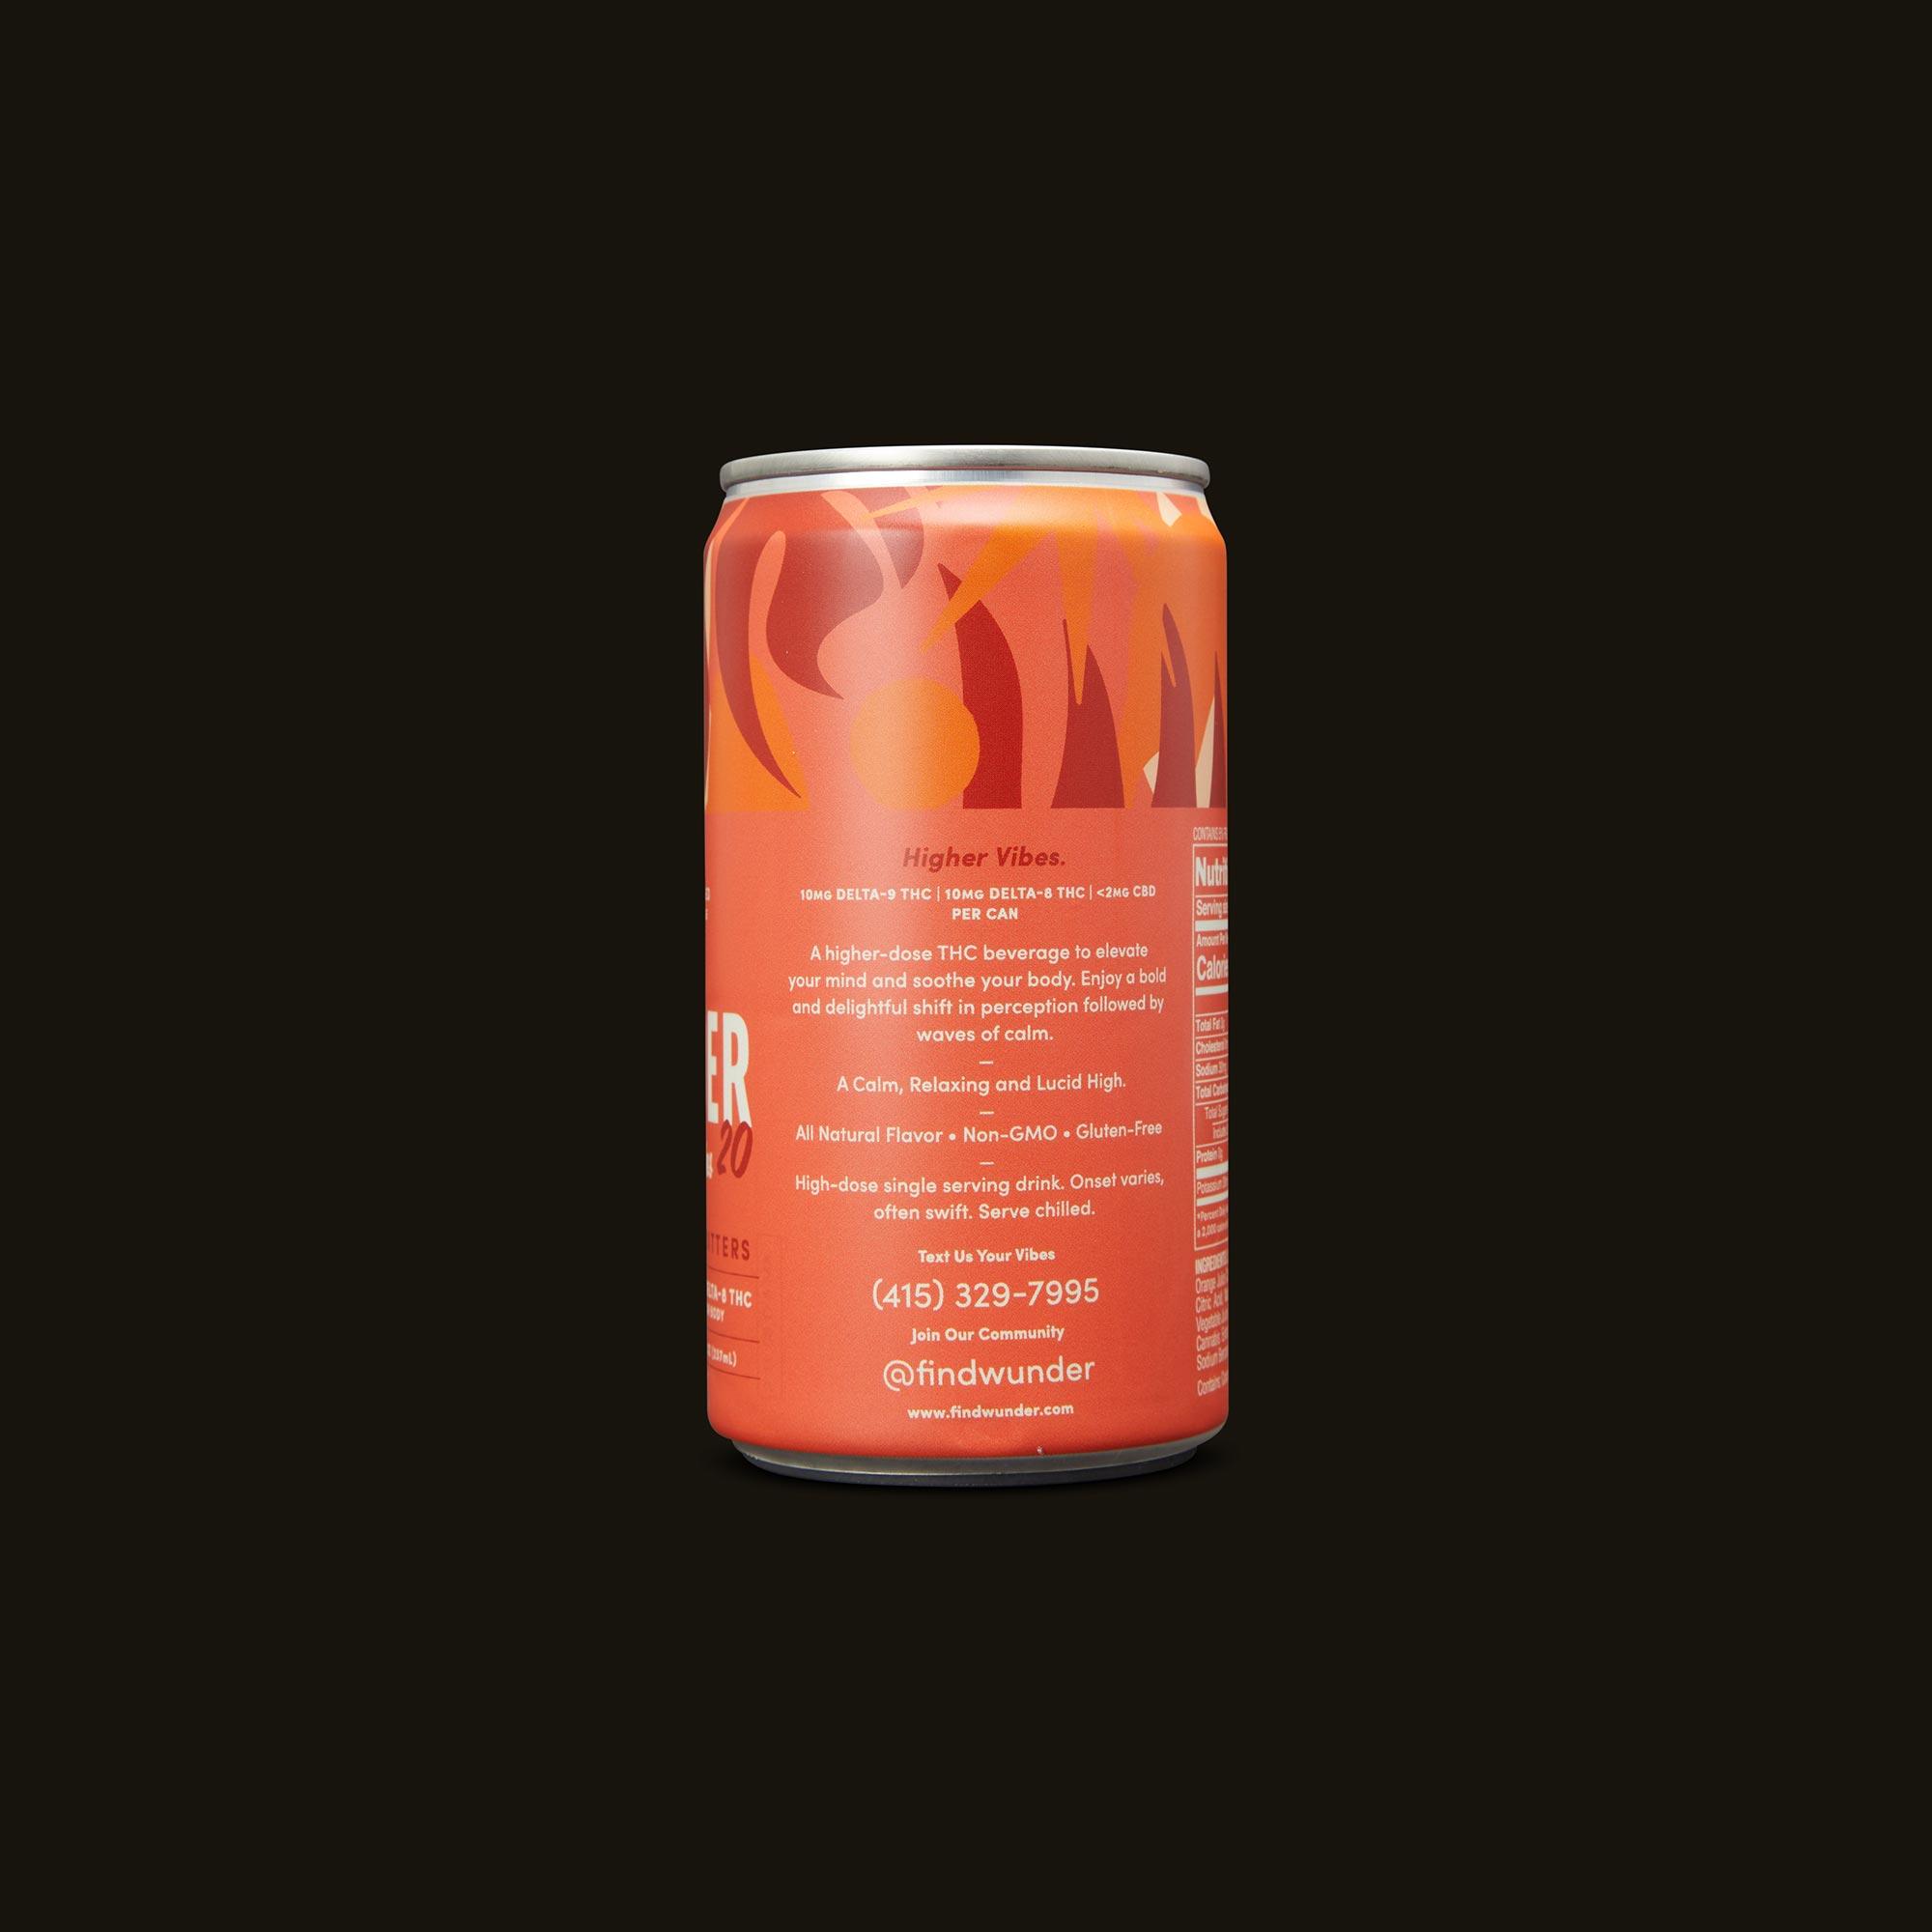 Wunder Higher Vibes Blood Orange Bitters 4-Pack Side Can